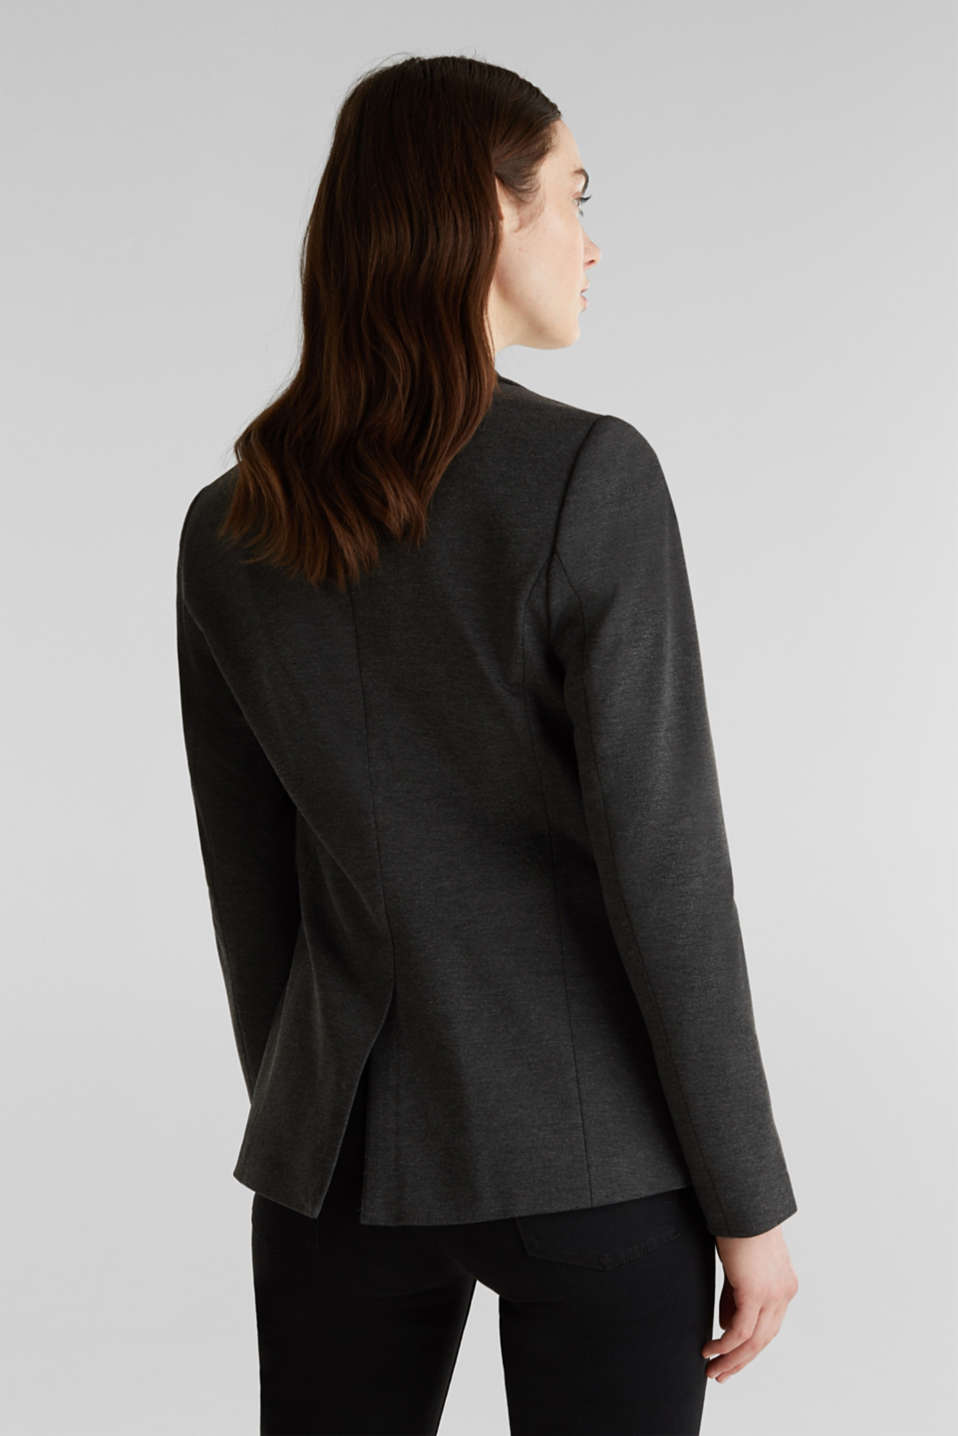 Stretch jersey blazer with pockets, DARK GREY, detail image number 3